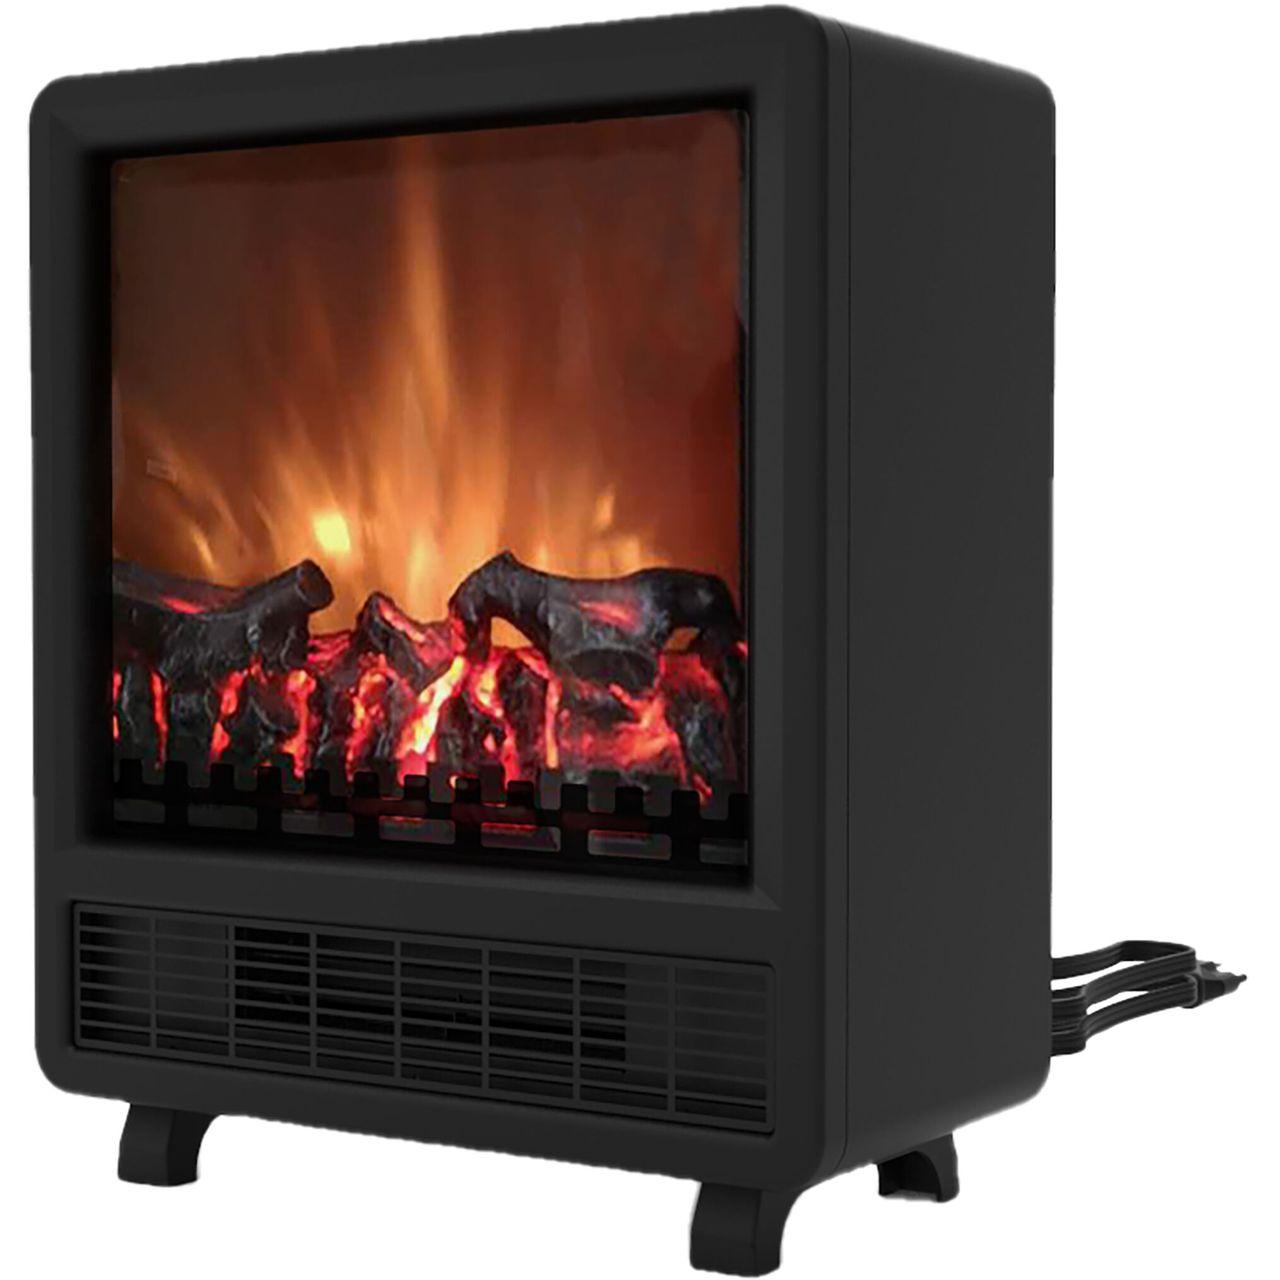 "Cambridge 17.8"" Freestanding 4606 BTU Electric Fireplace - Black"